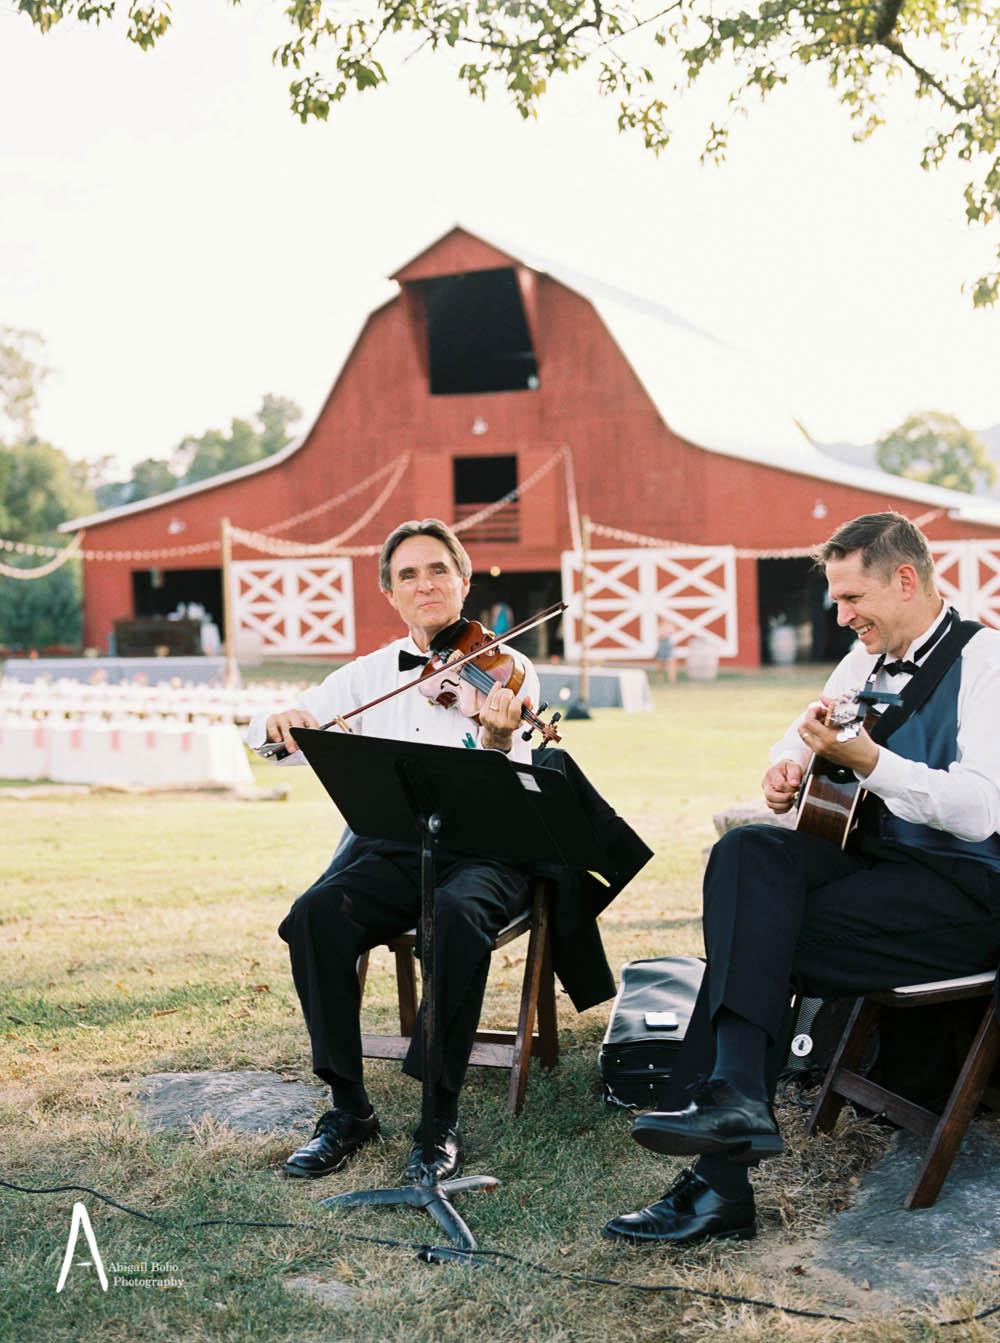 lilac farms at arrington vineyards wedding photography ©2015abigailbobophotography-28.jpg